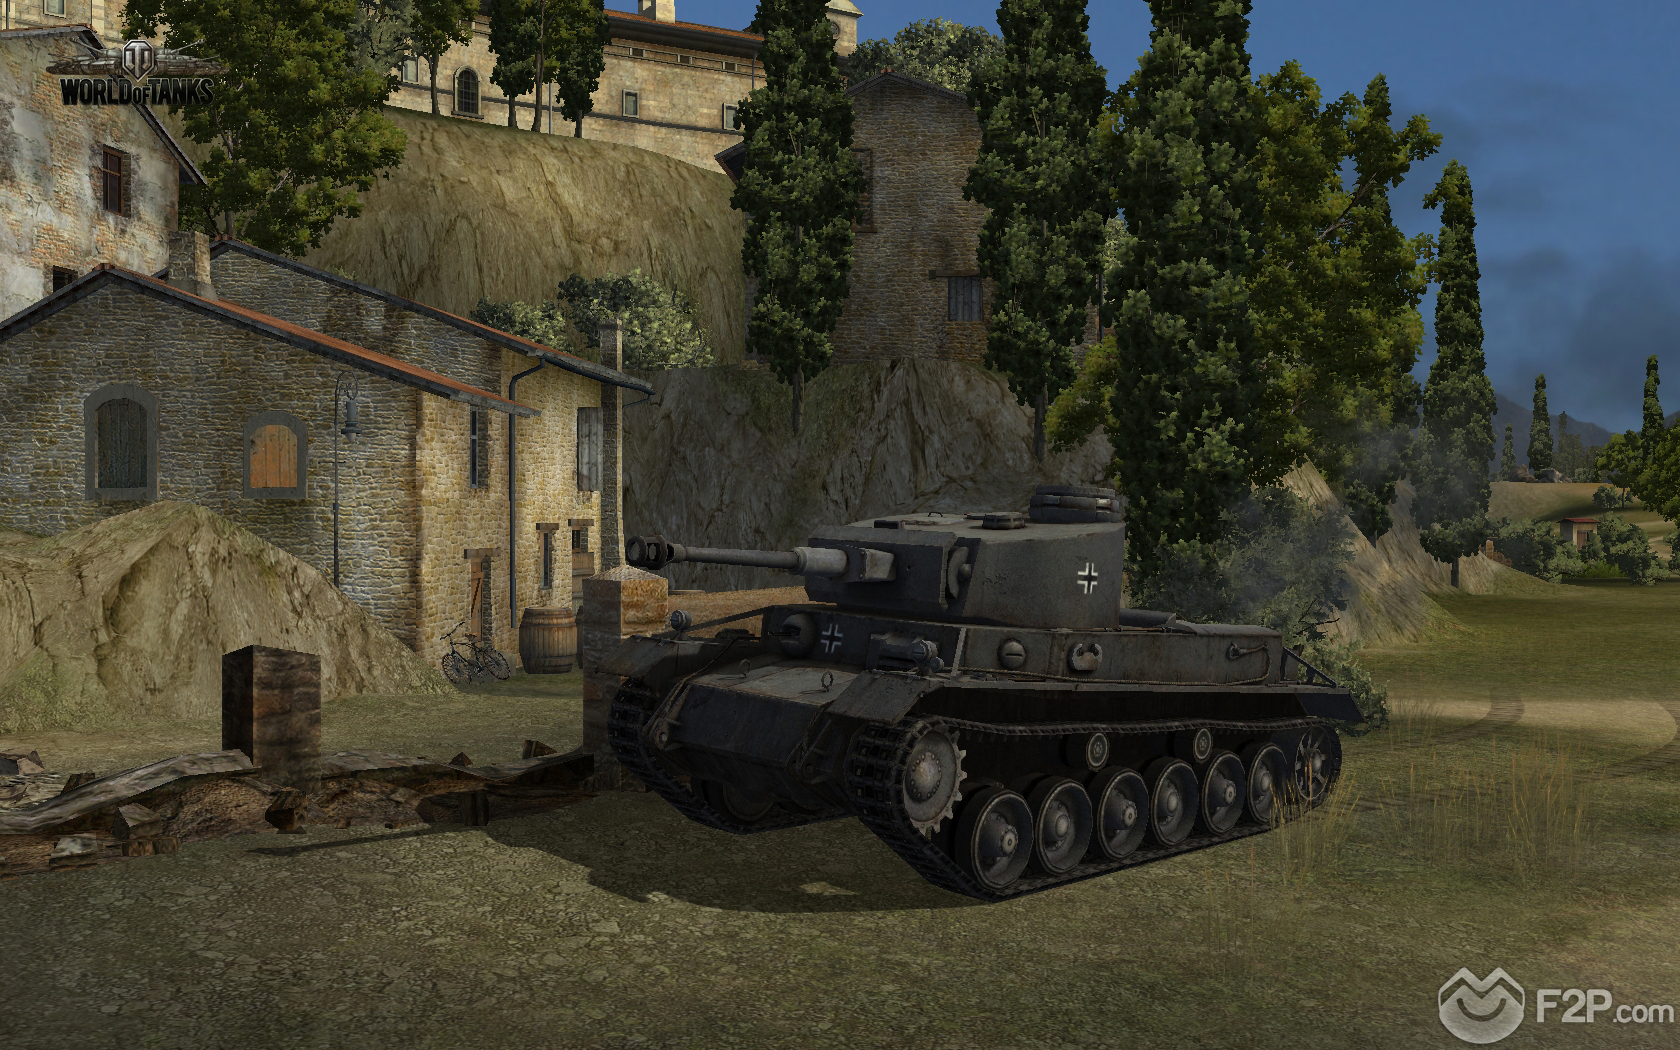 Click image for larger version.Name:World of Tanks 63.jpgViews:134Size:1.56 MBID:3843